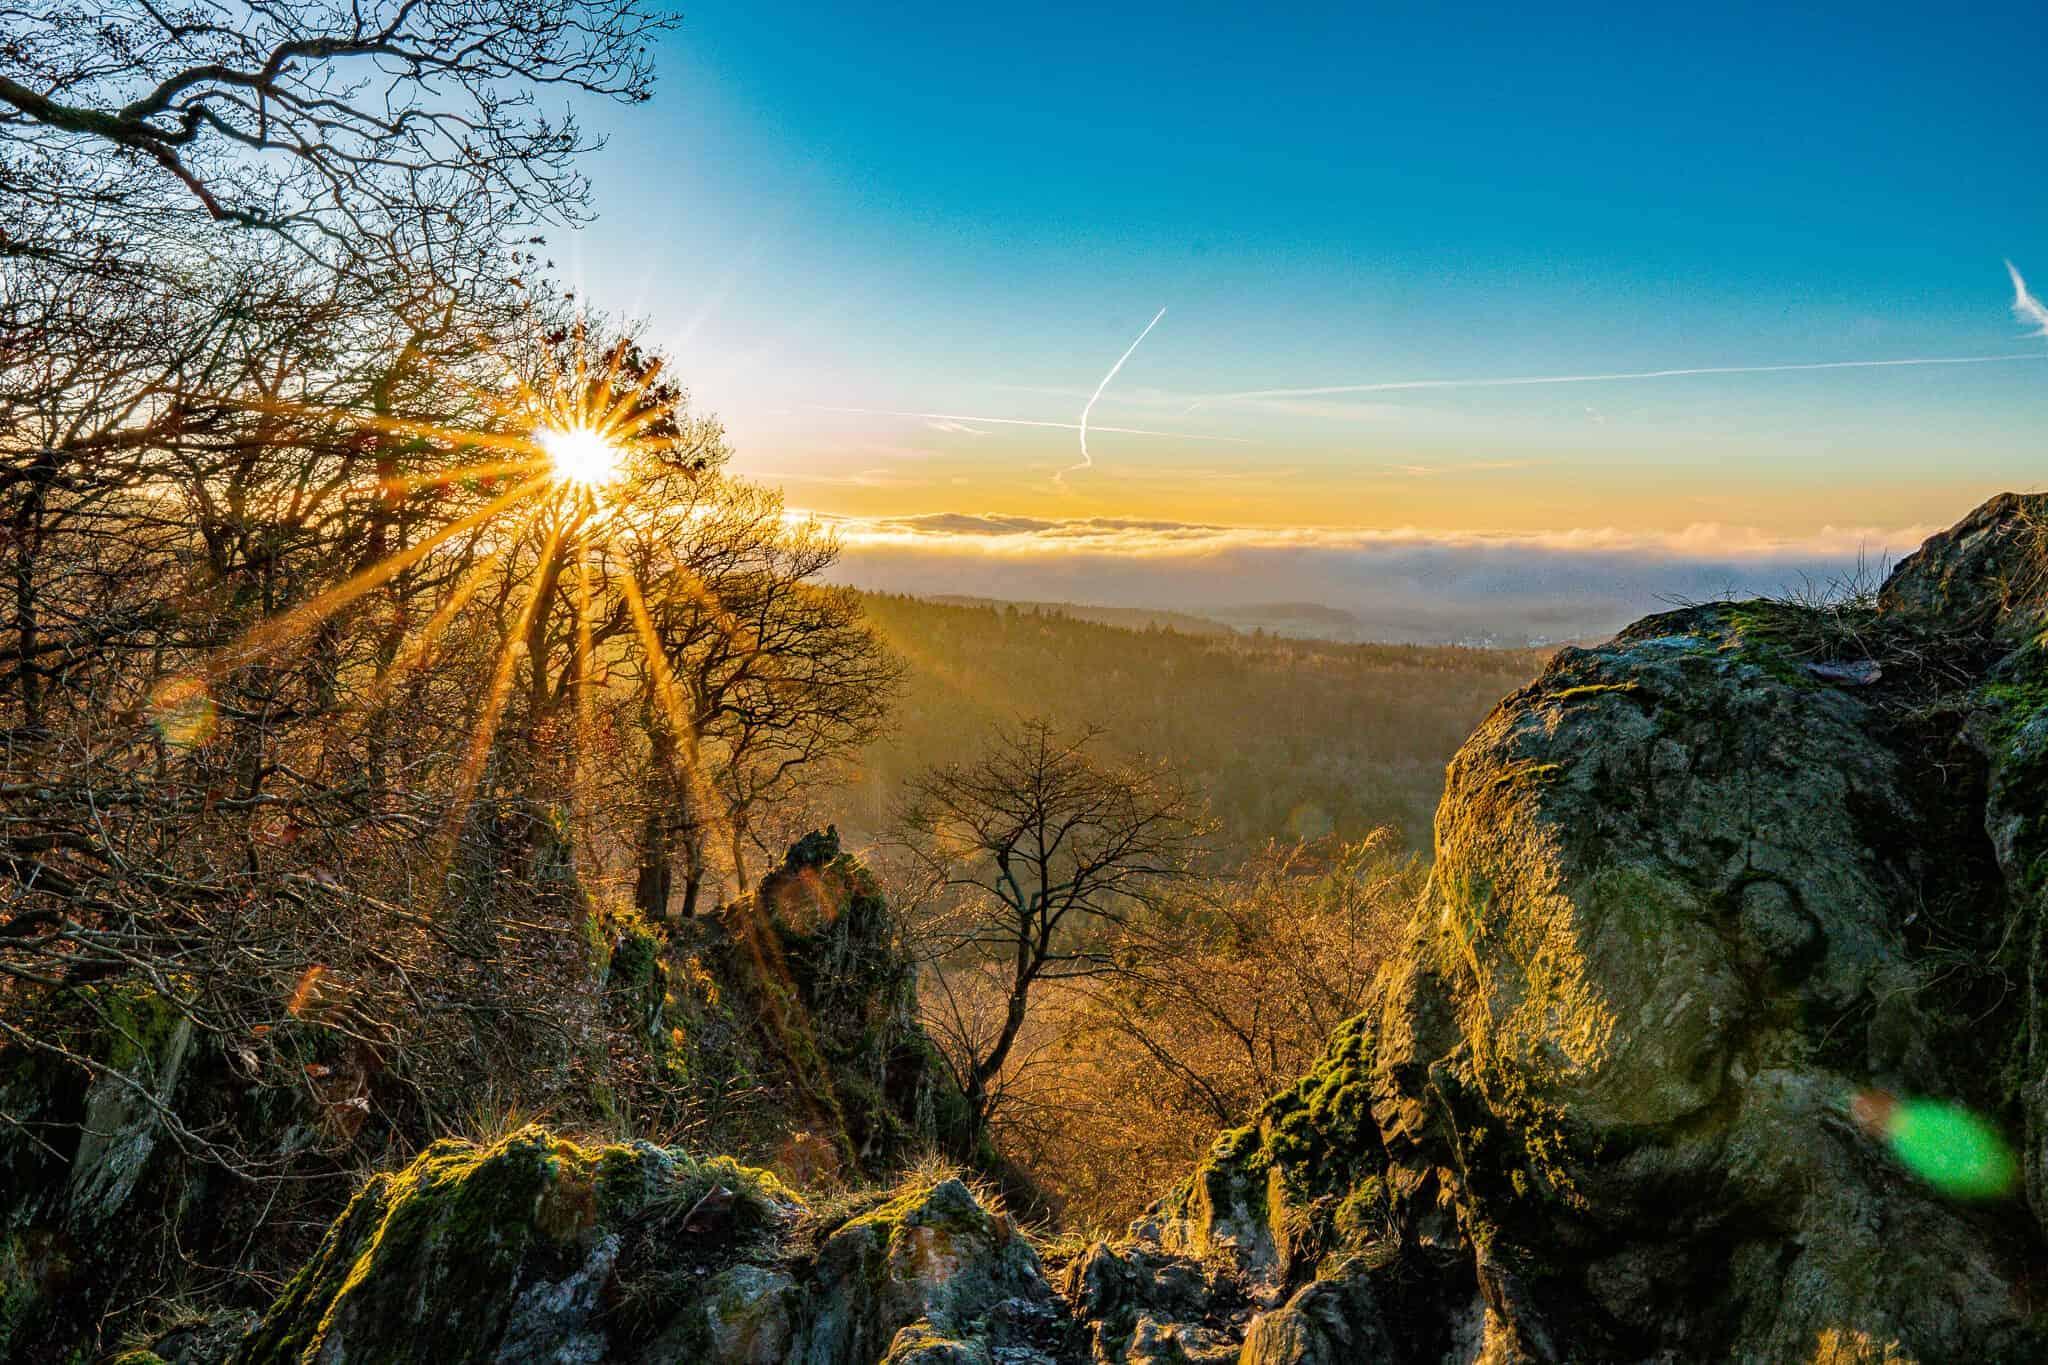 Zacken Sonnenuntergang